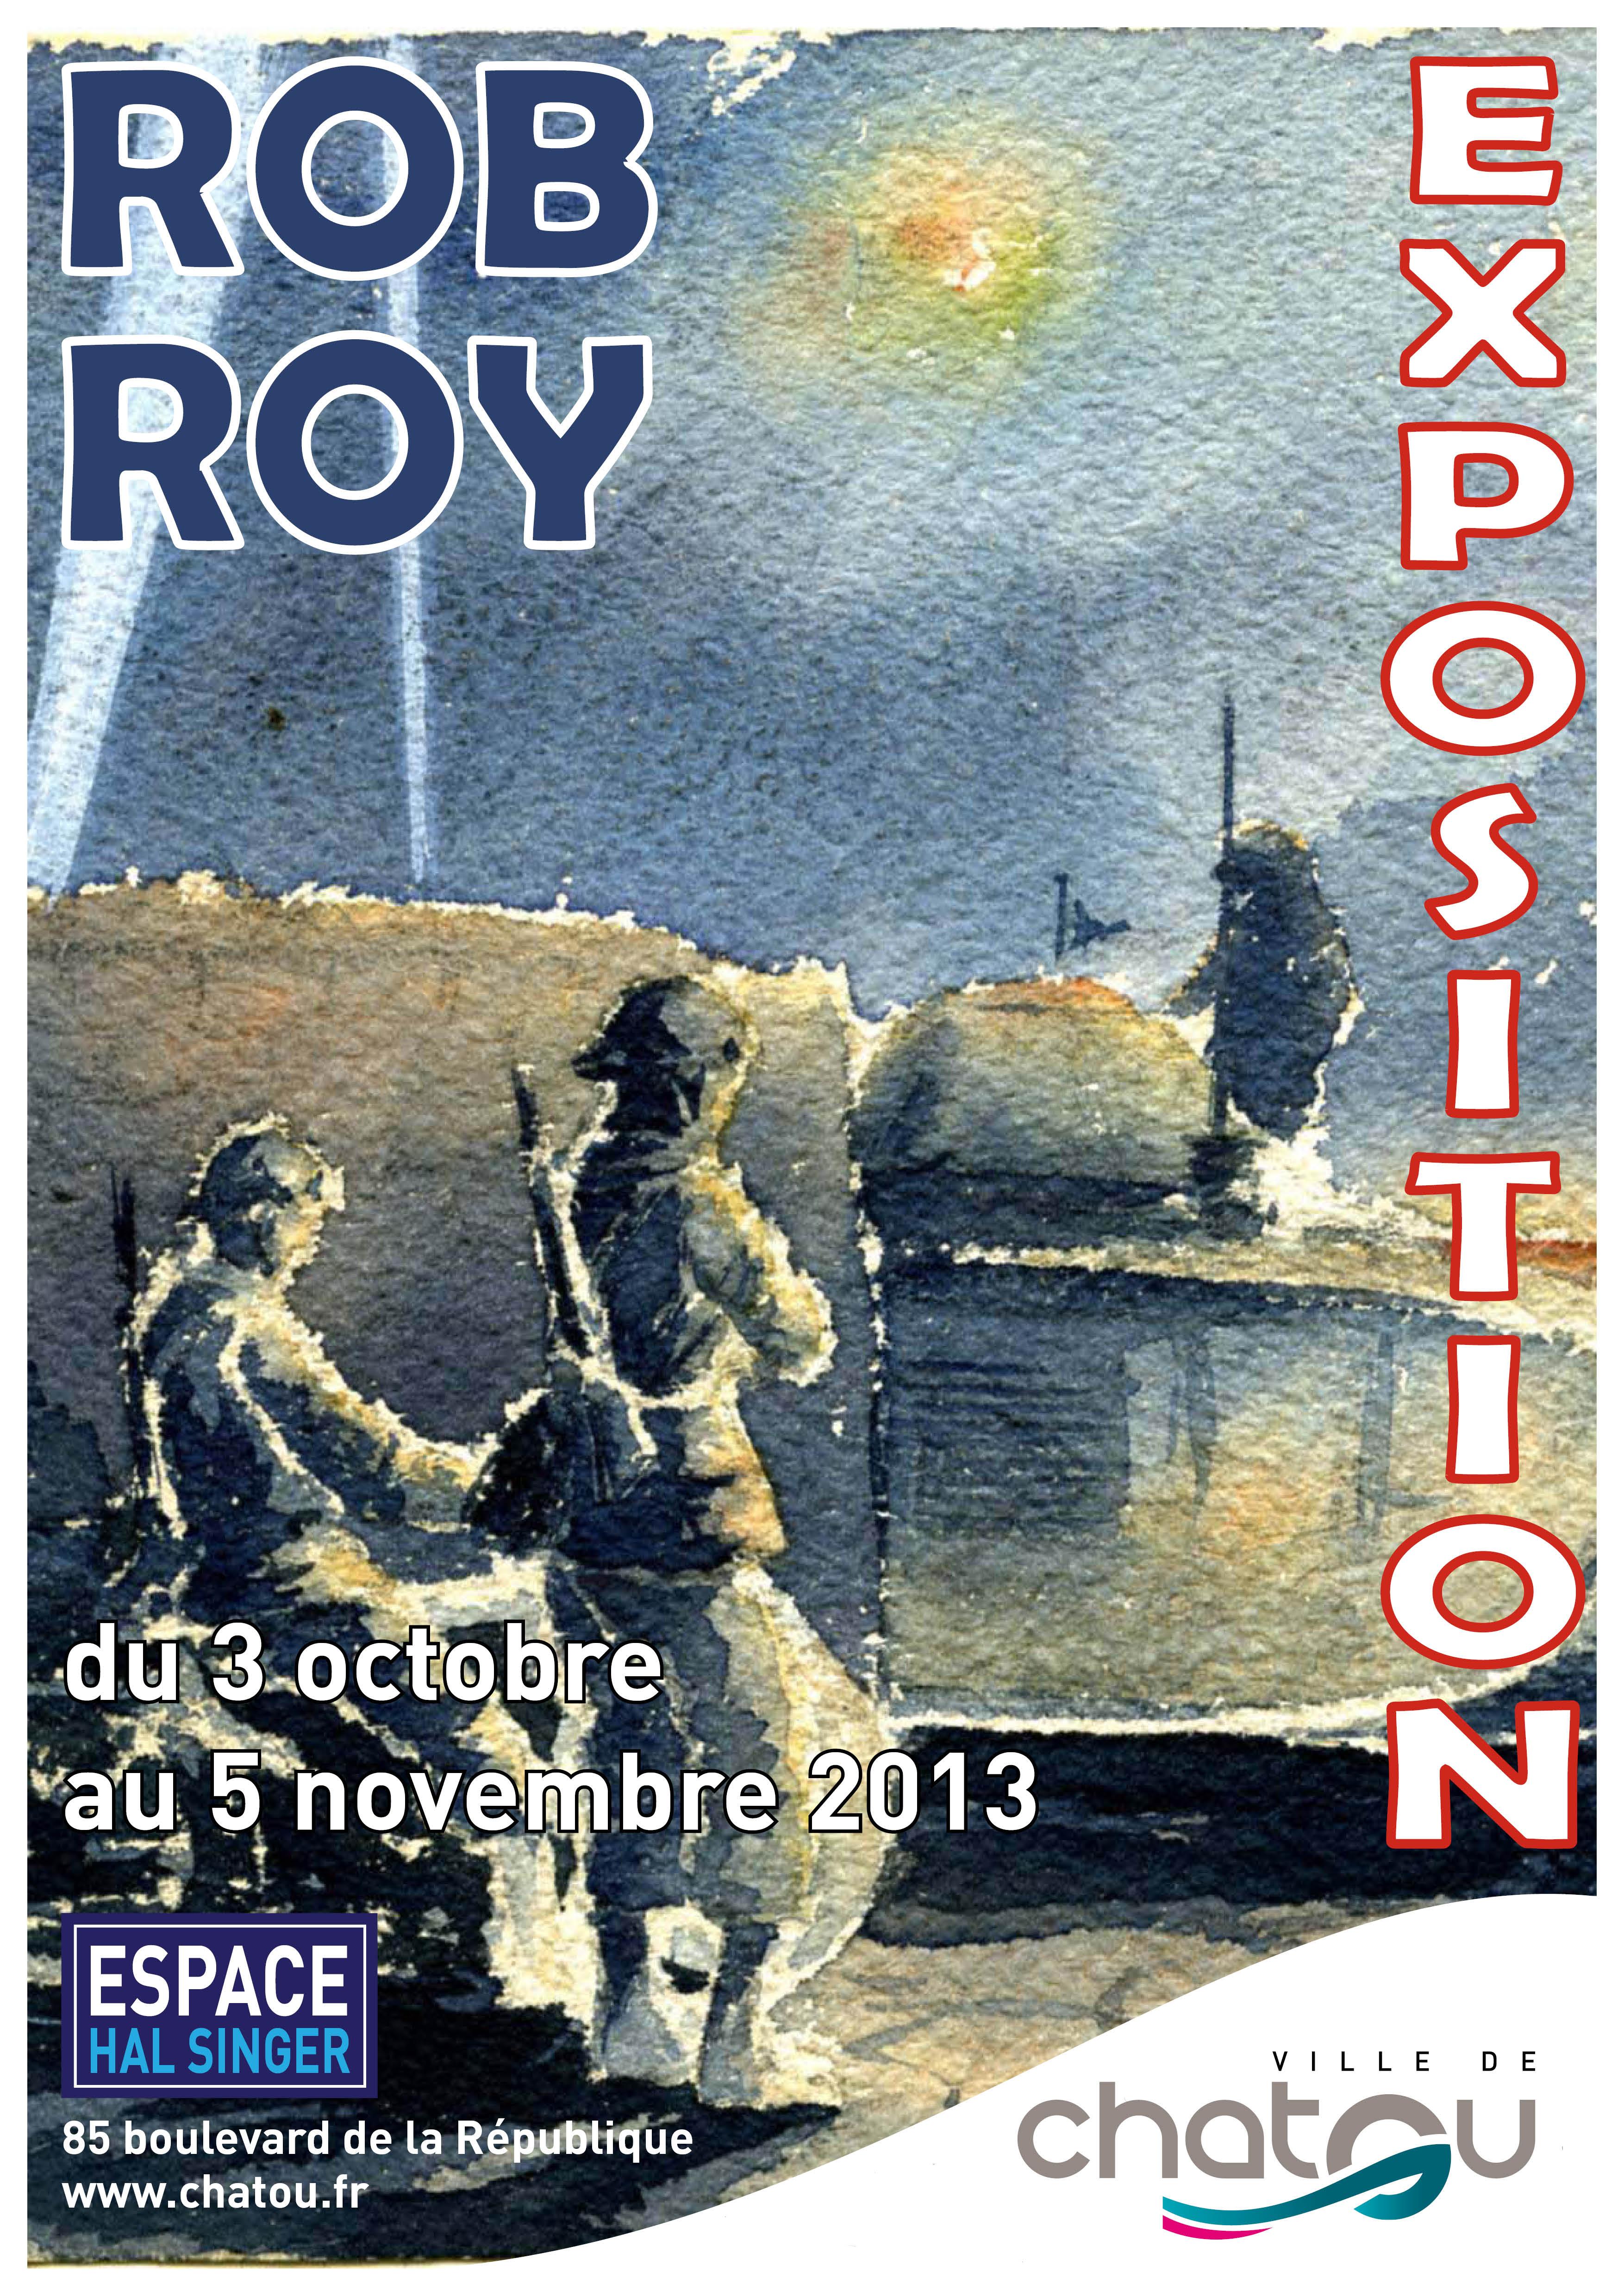 image rob roy